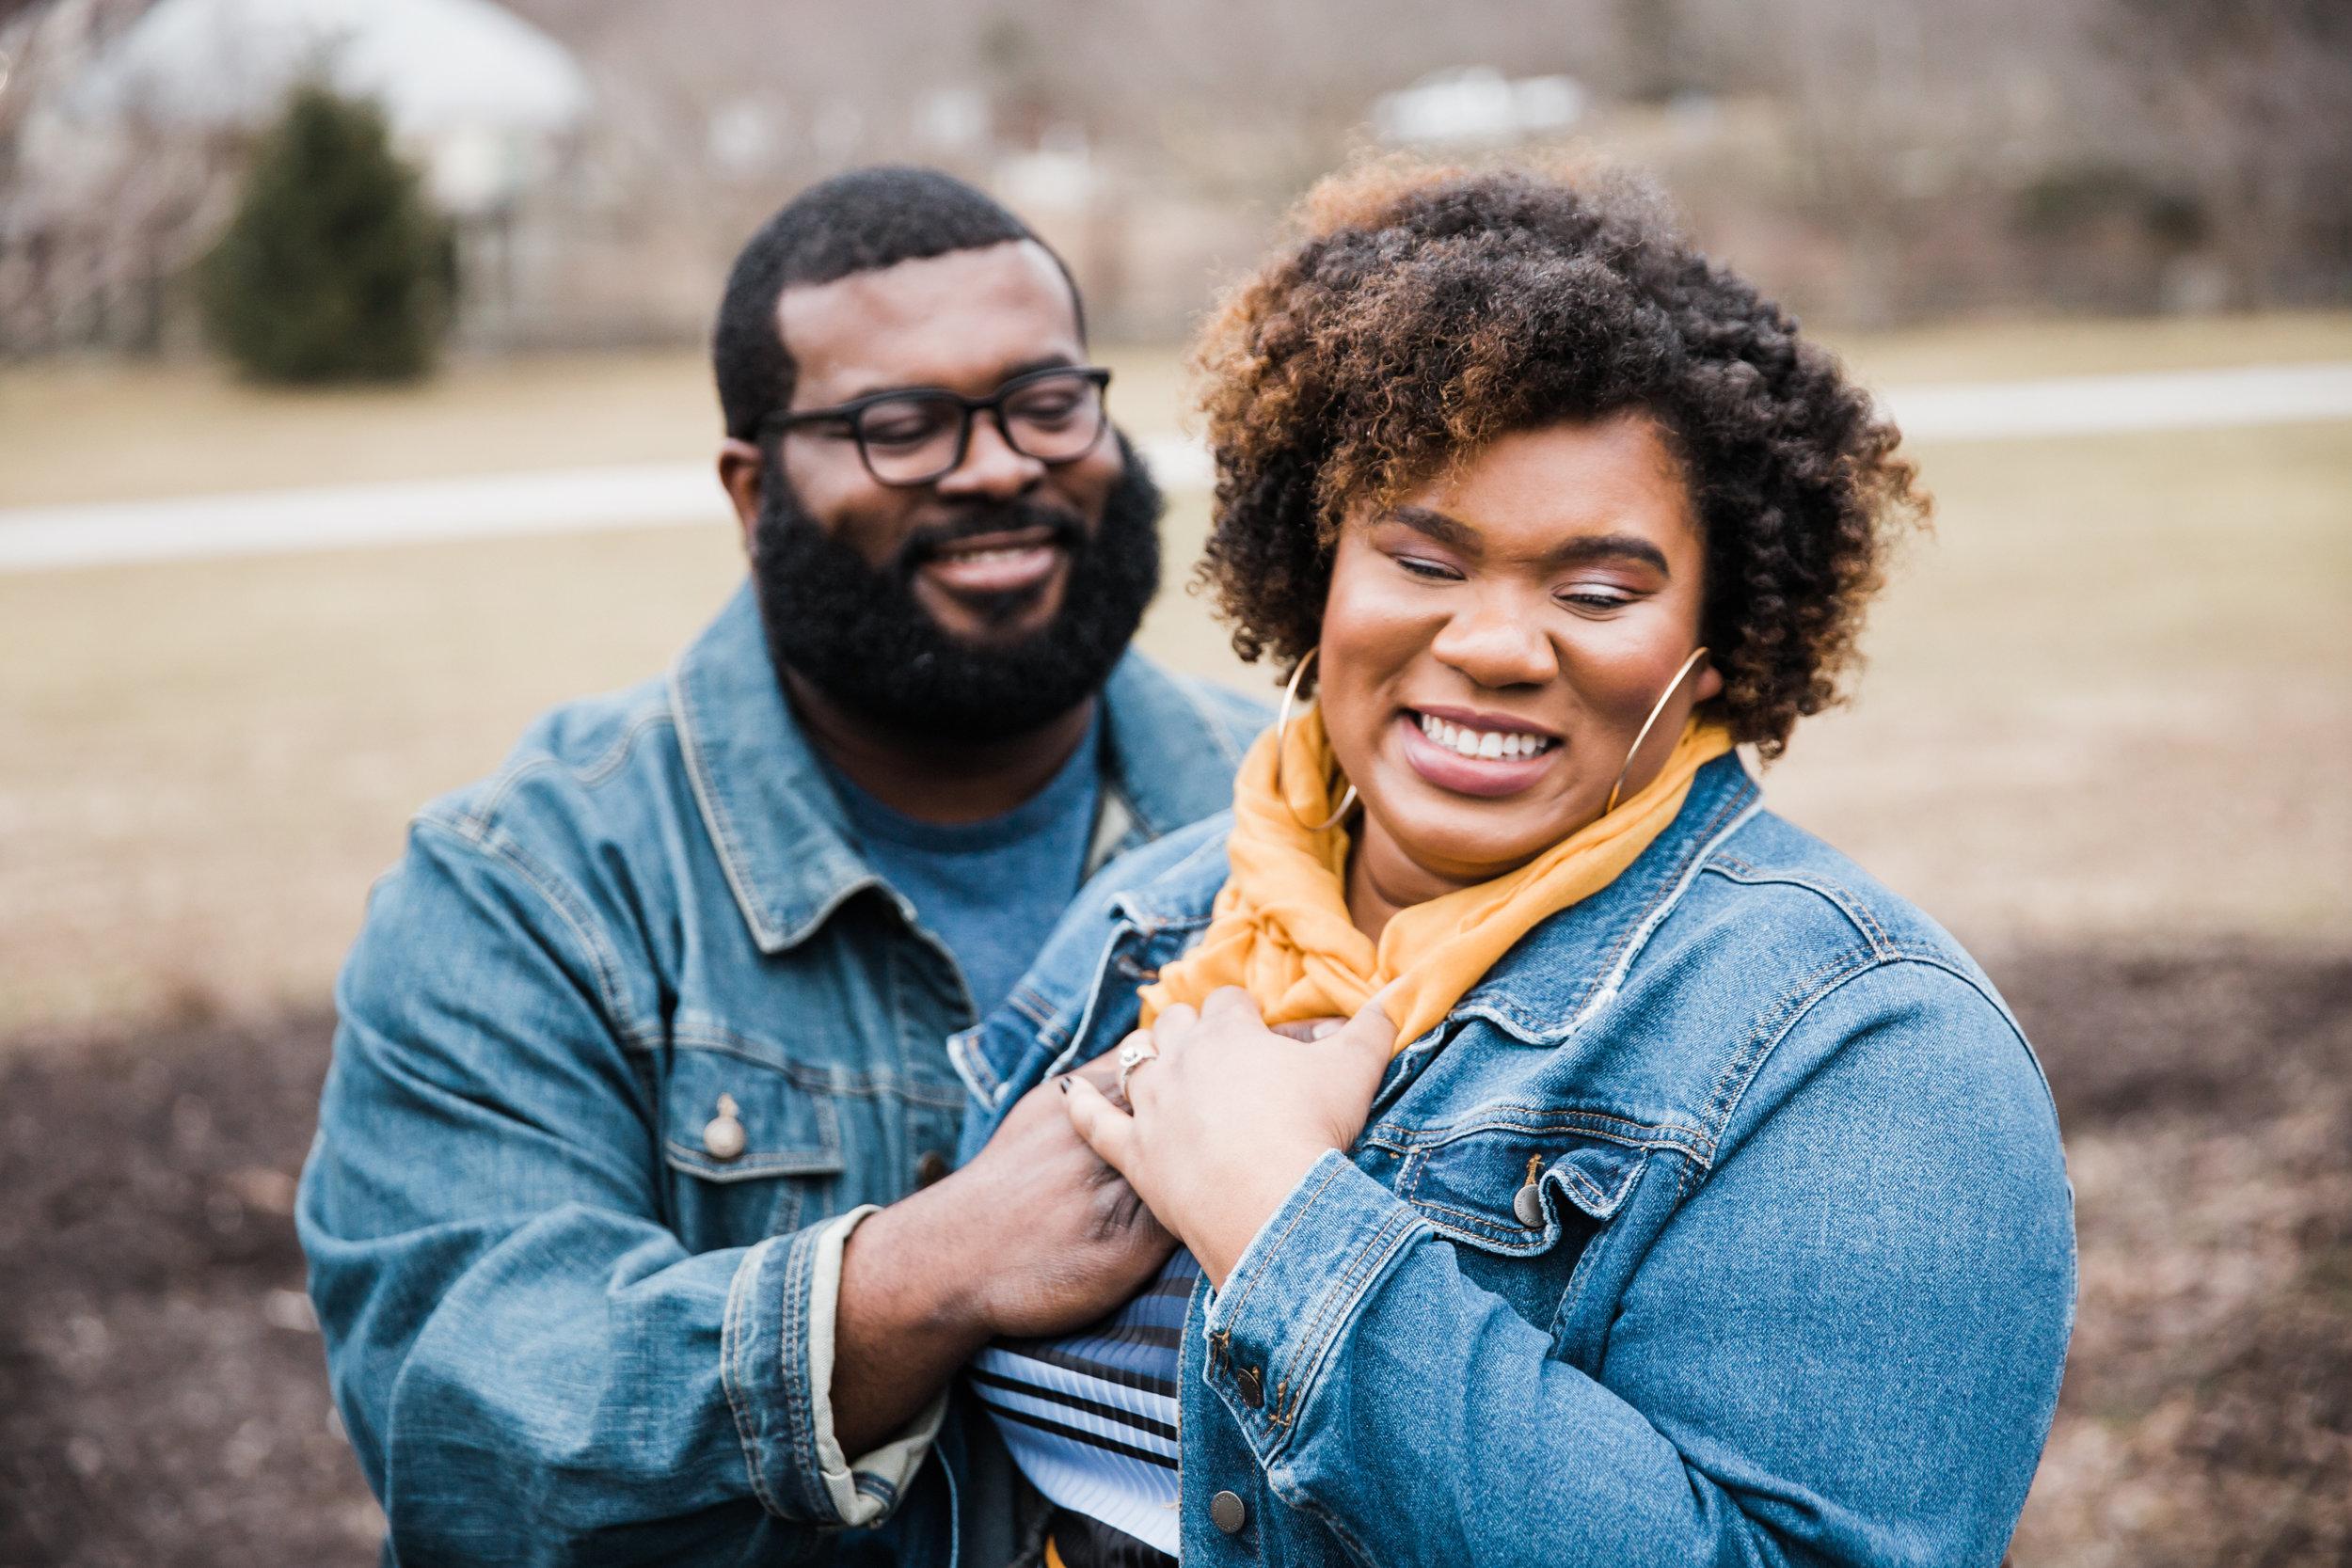 Black Natural Hair Bride Bkack Wedding Photographers Megapixels Media Photography Baltimore Maryland Centennial Park Columbia-38.jpg